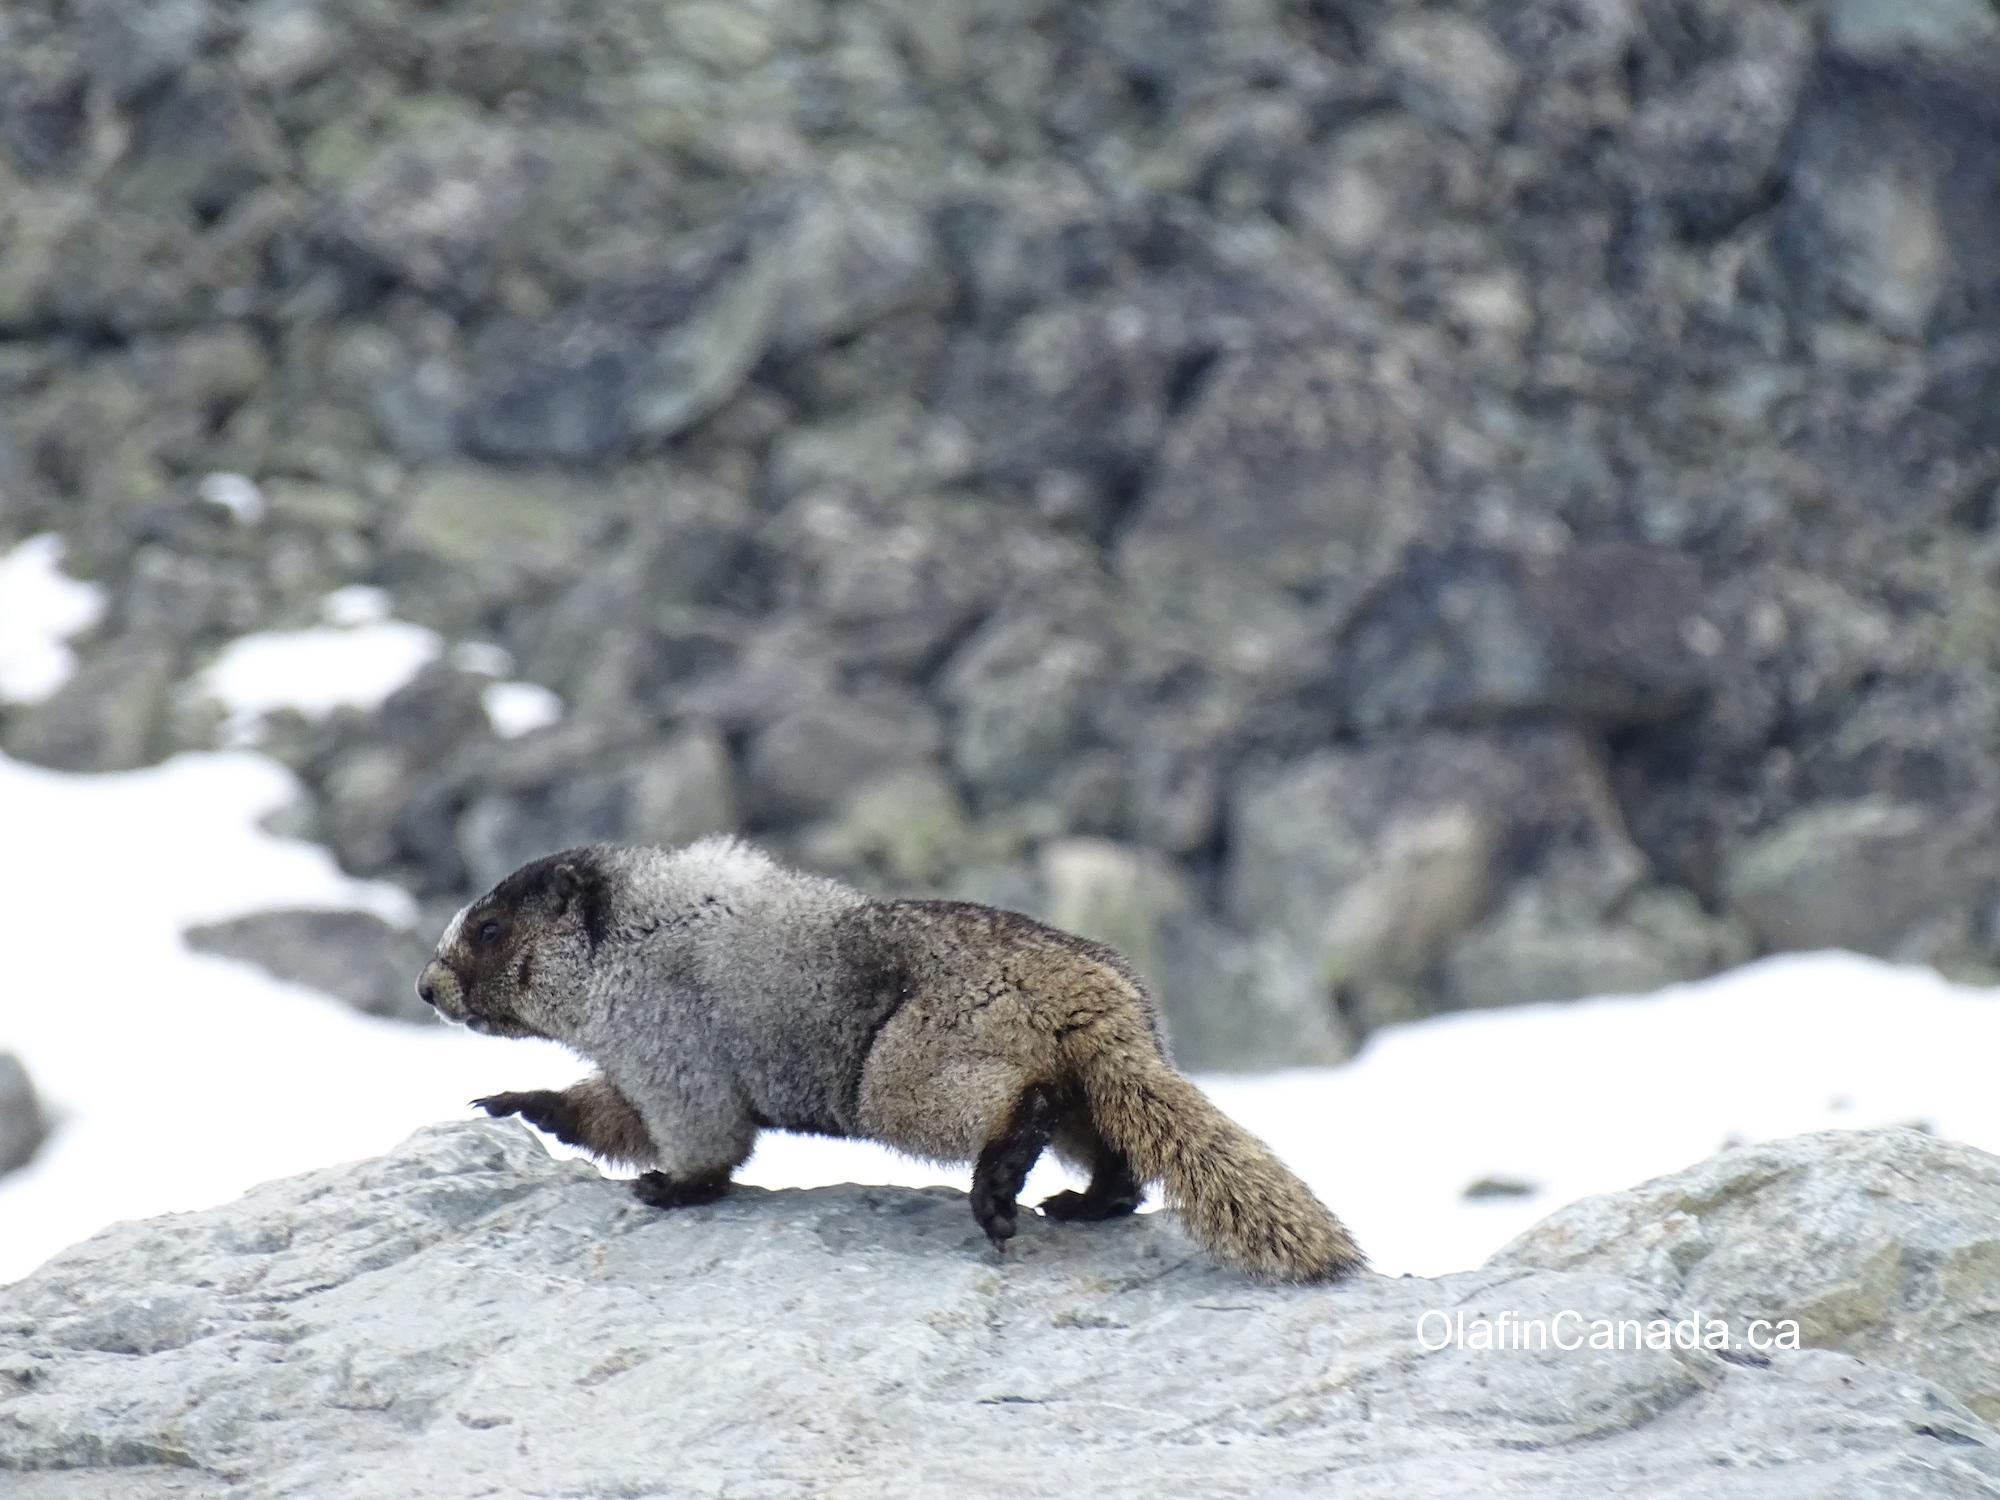 Hoary marmot on top of Whistler Mountain #olafincanada #britishcolumbia #discoverbc #wildlife #whistler #hoarymarmot